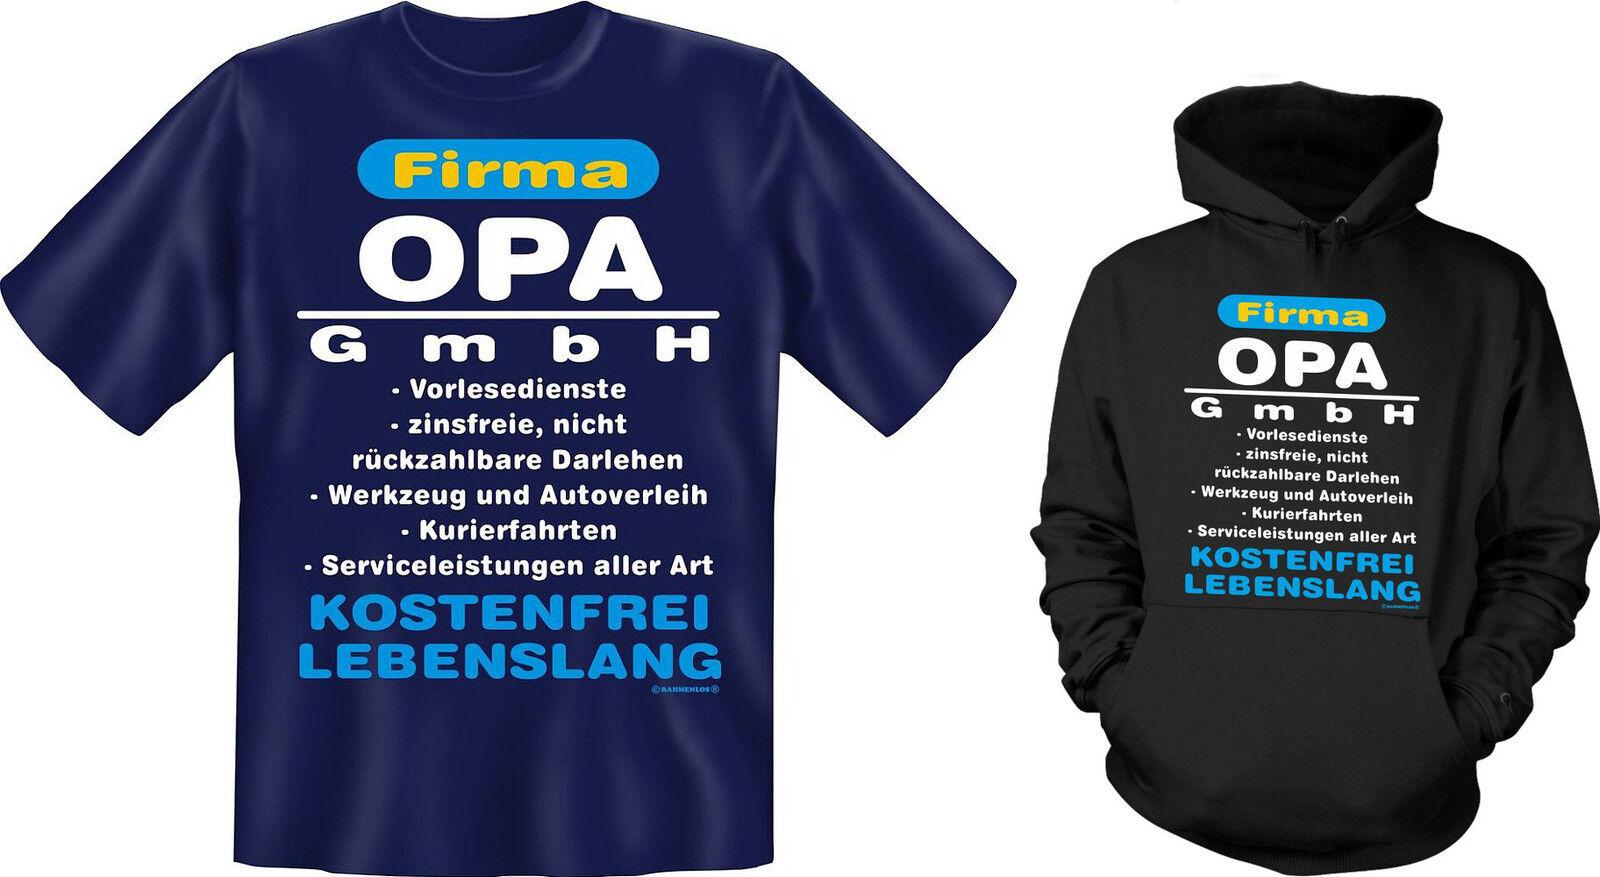 Kapuzenshirt Hoodie od. T-Shirt Firma Opa GmbH Opi Neu Baumwolle  | Guter weltweiter Ruf  | Deutsche Outlets  | Kostengünstiger